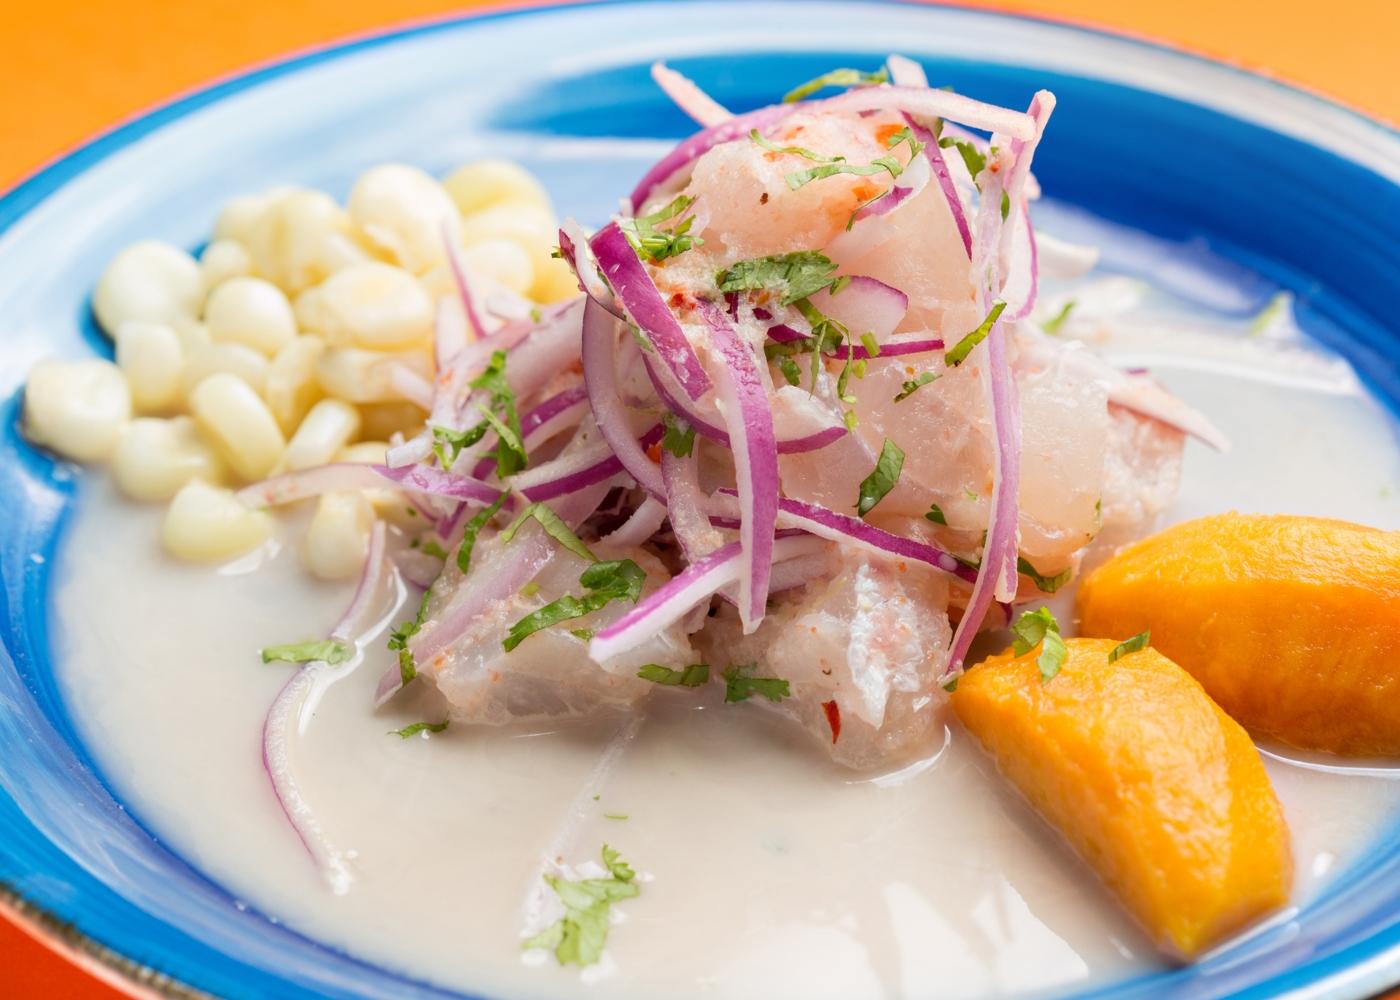 Ceviche de peixe branco com marinada especial